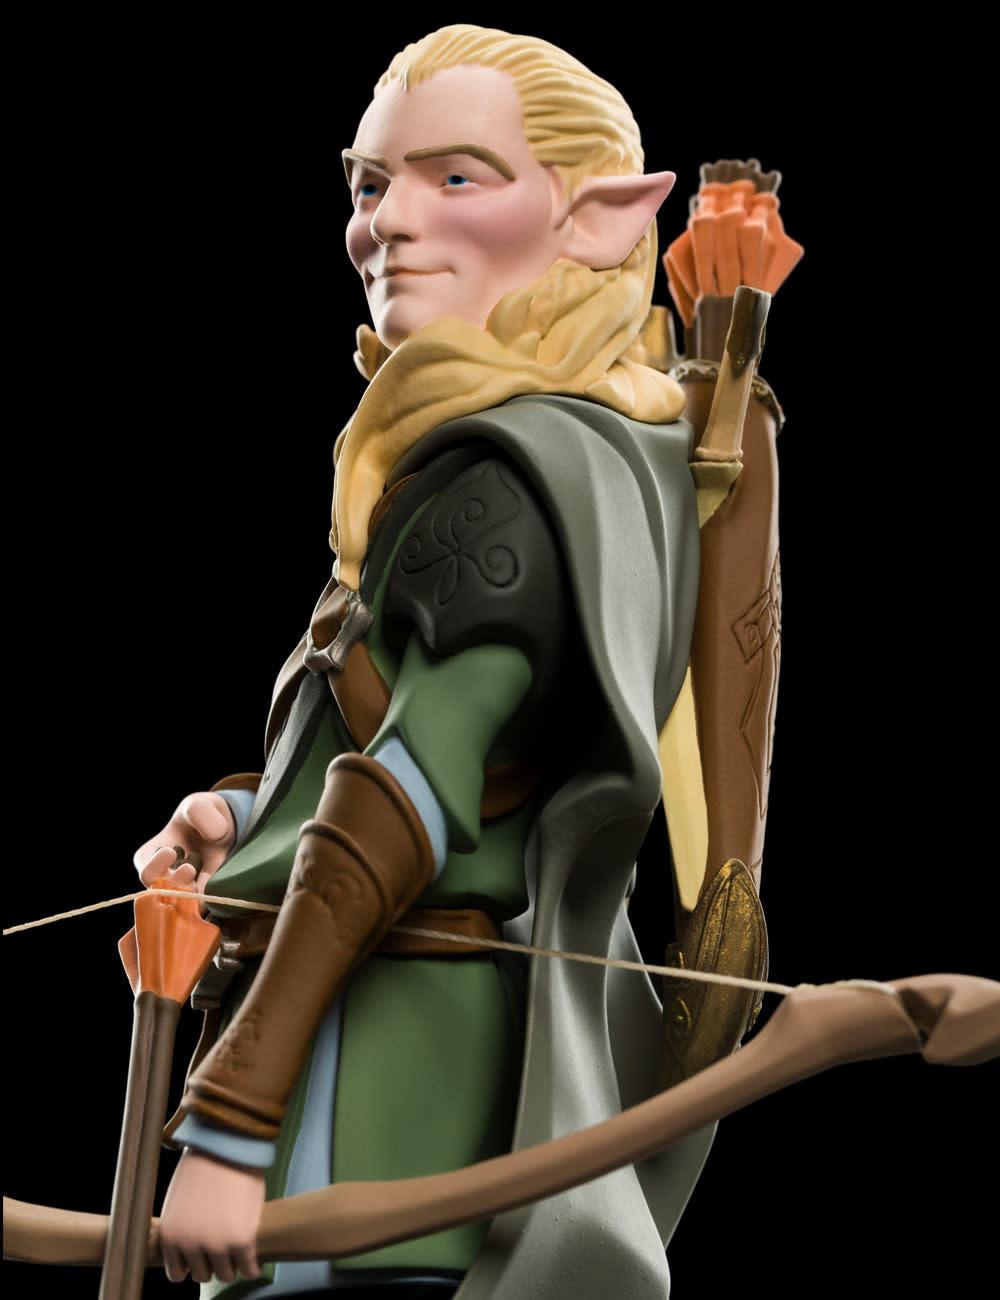 weta The Lord of the Rings: Vinyl Mini Epics - Legolas